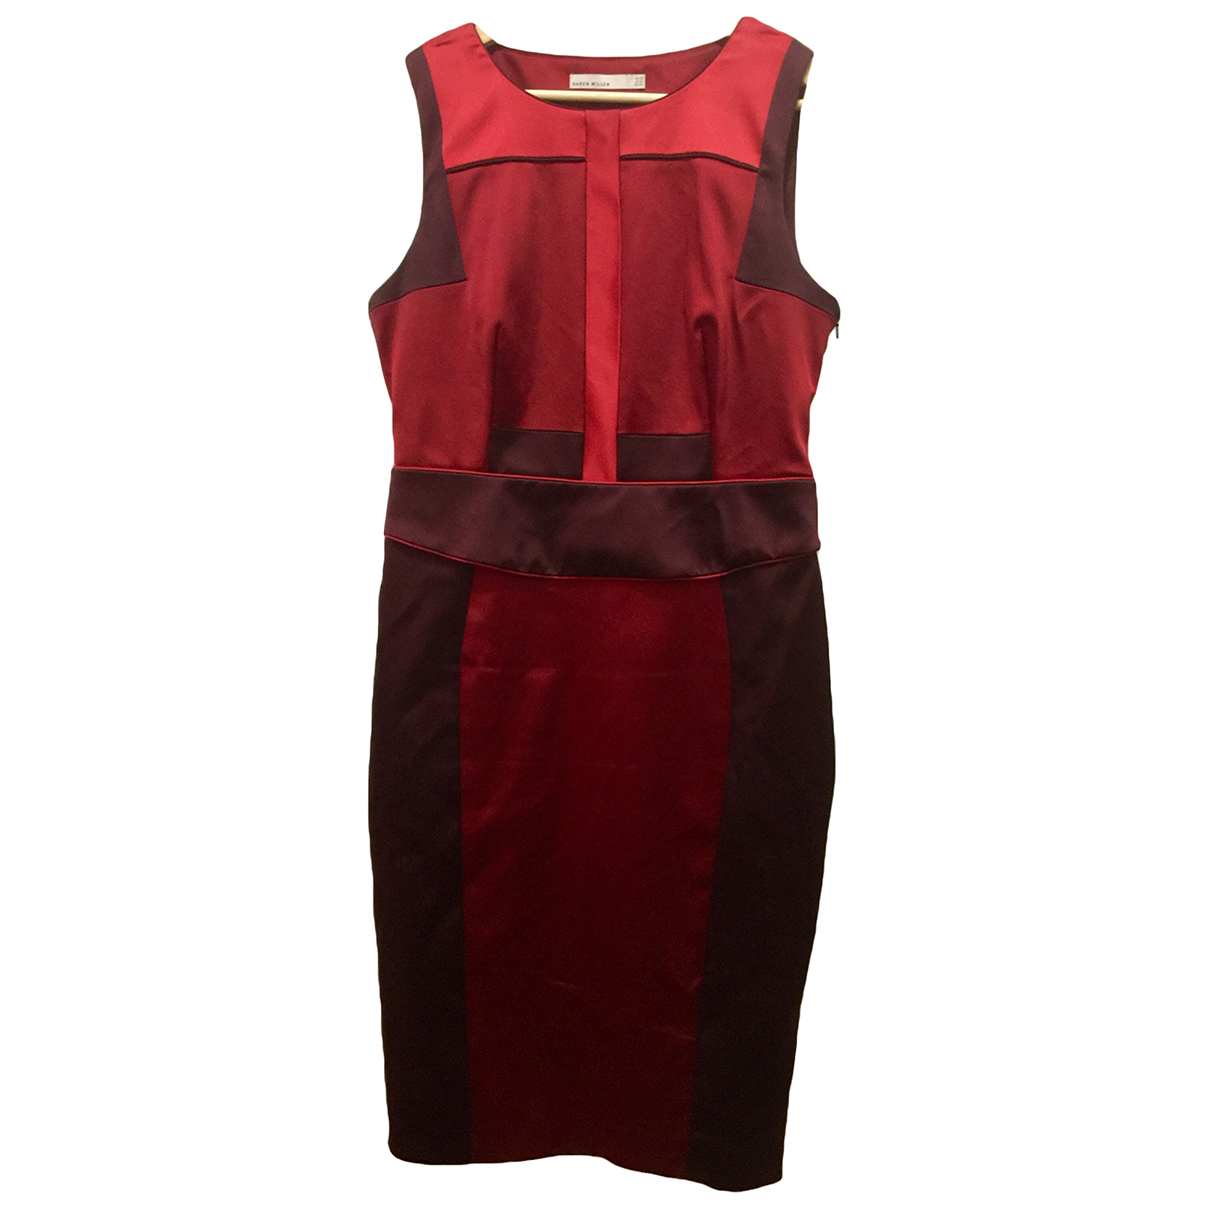 Karen Millen \N Red Cotton - elasthane dress for Women 16 UK